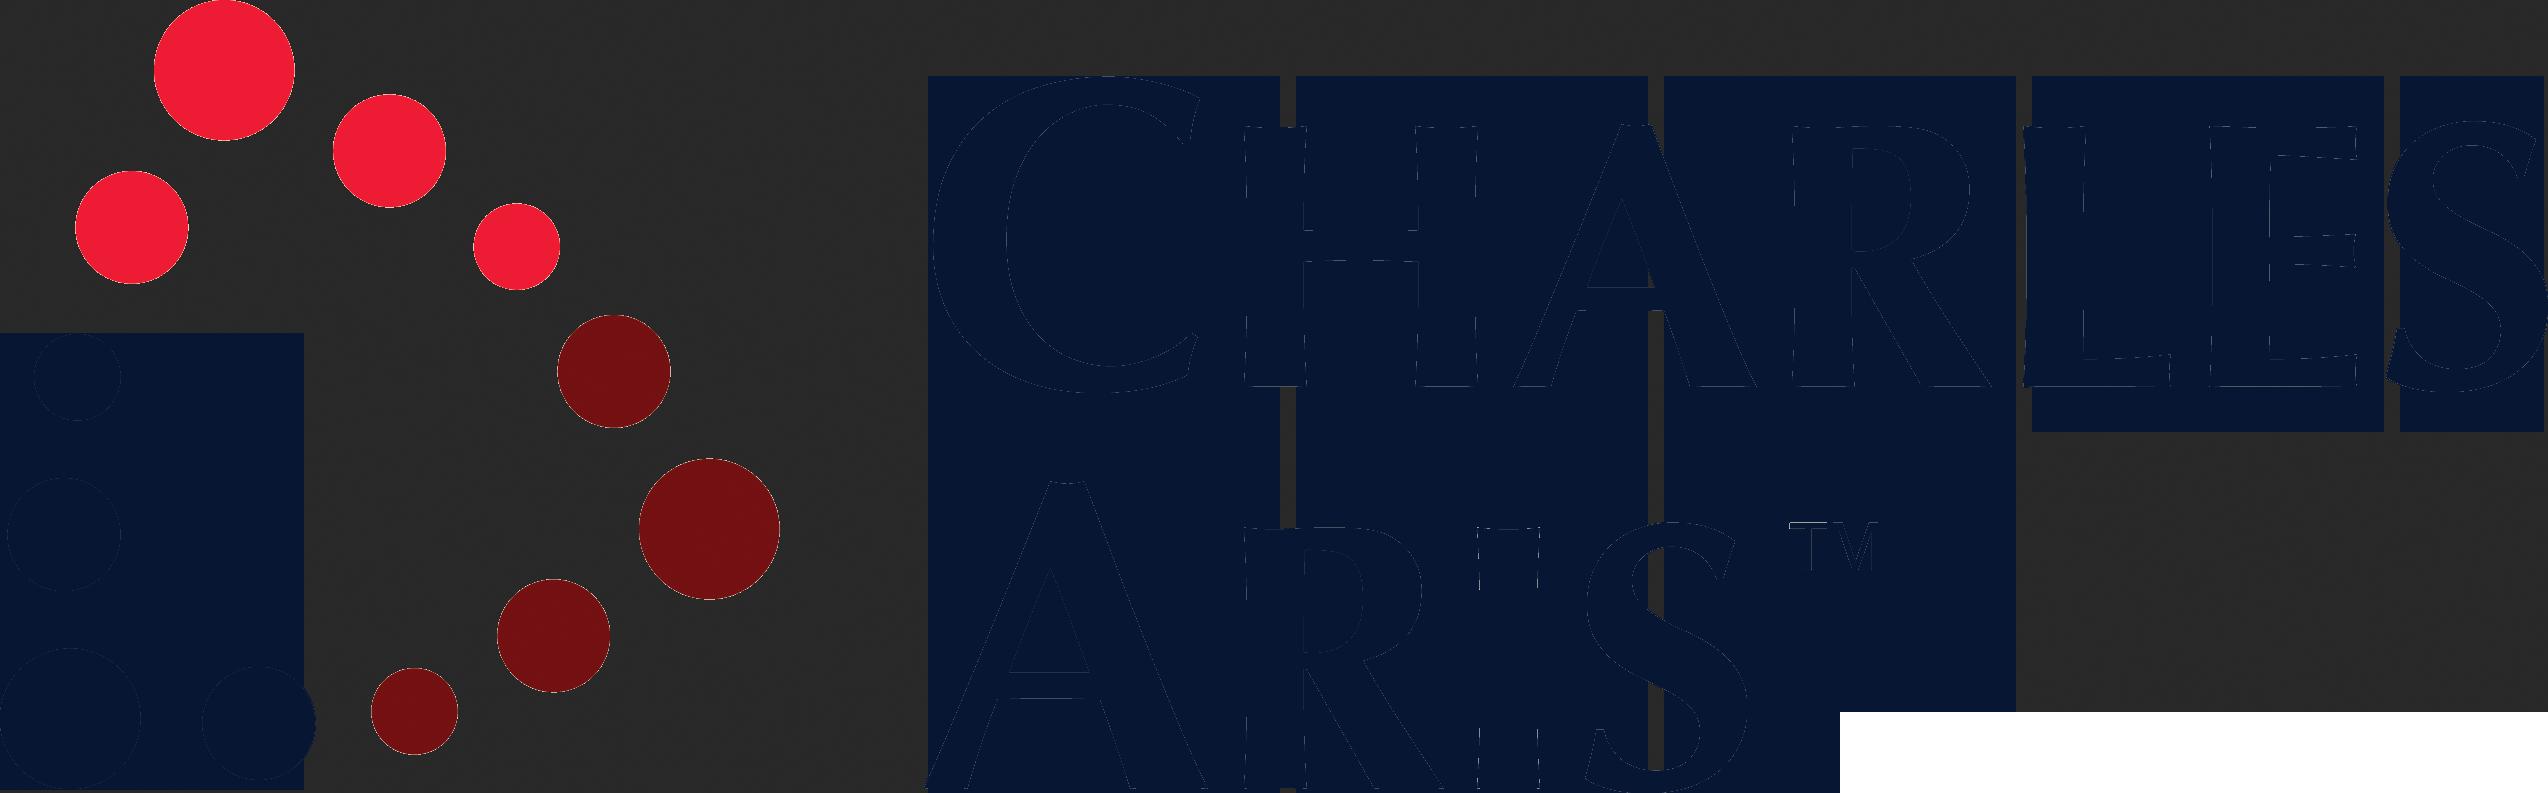 Charles Aris, Inc.